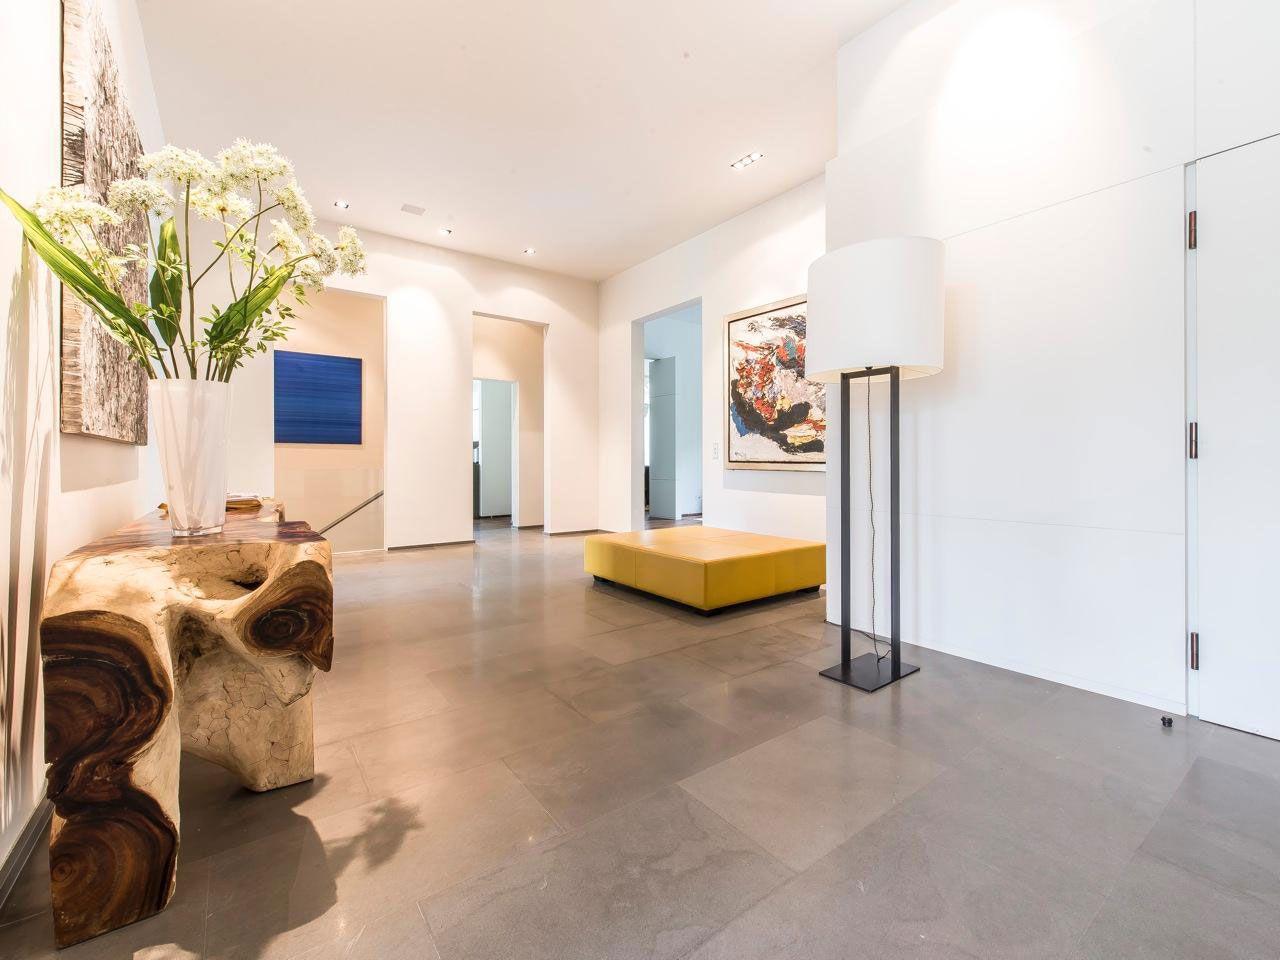 Chic Elegant Apartment in Brussels With Bright Interiors-05